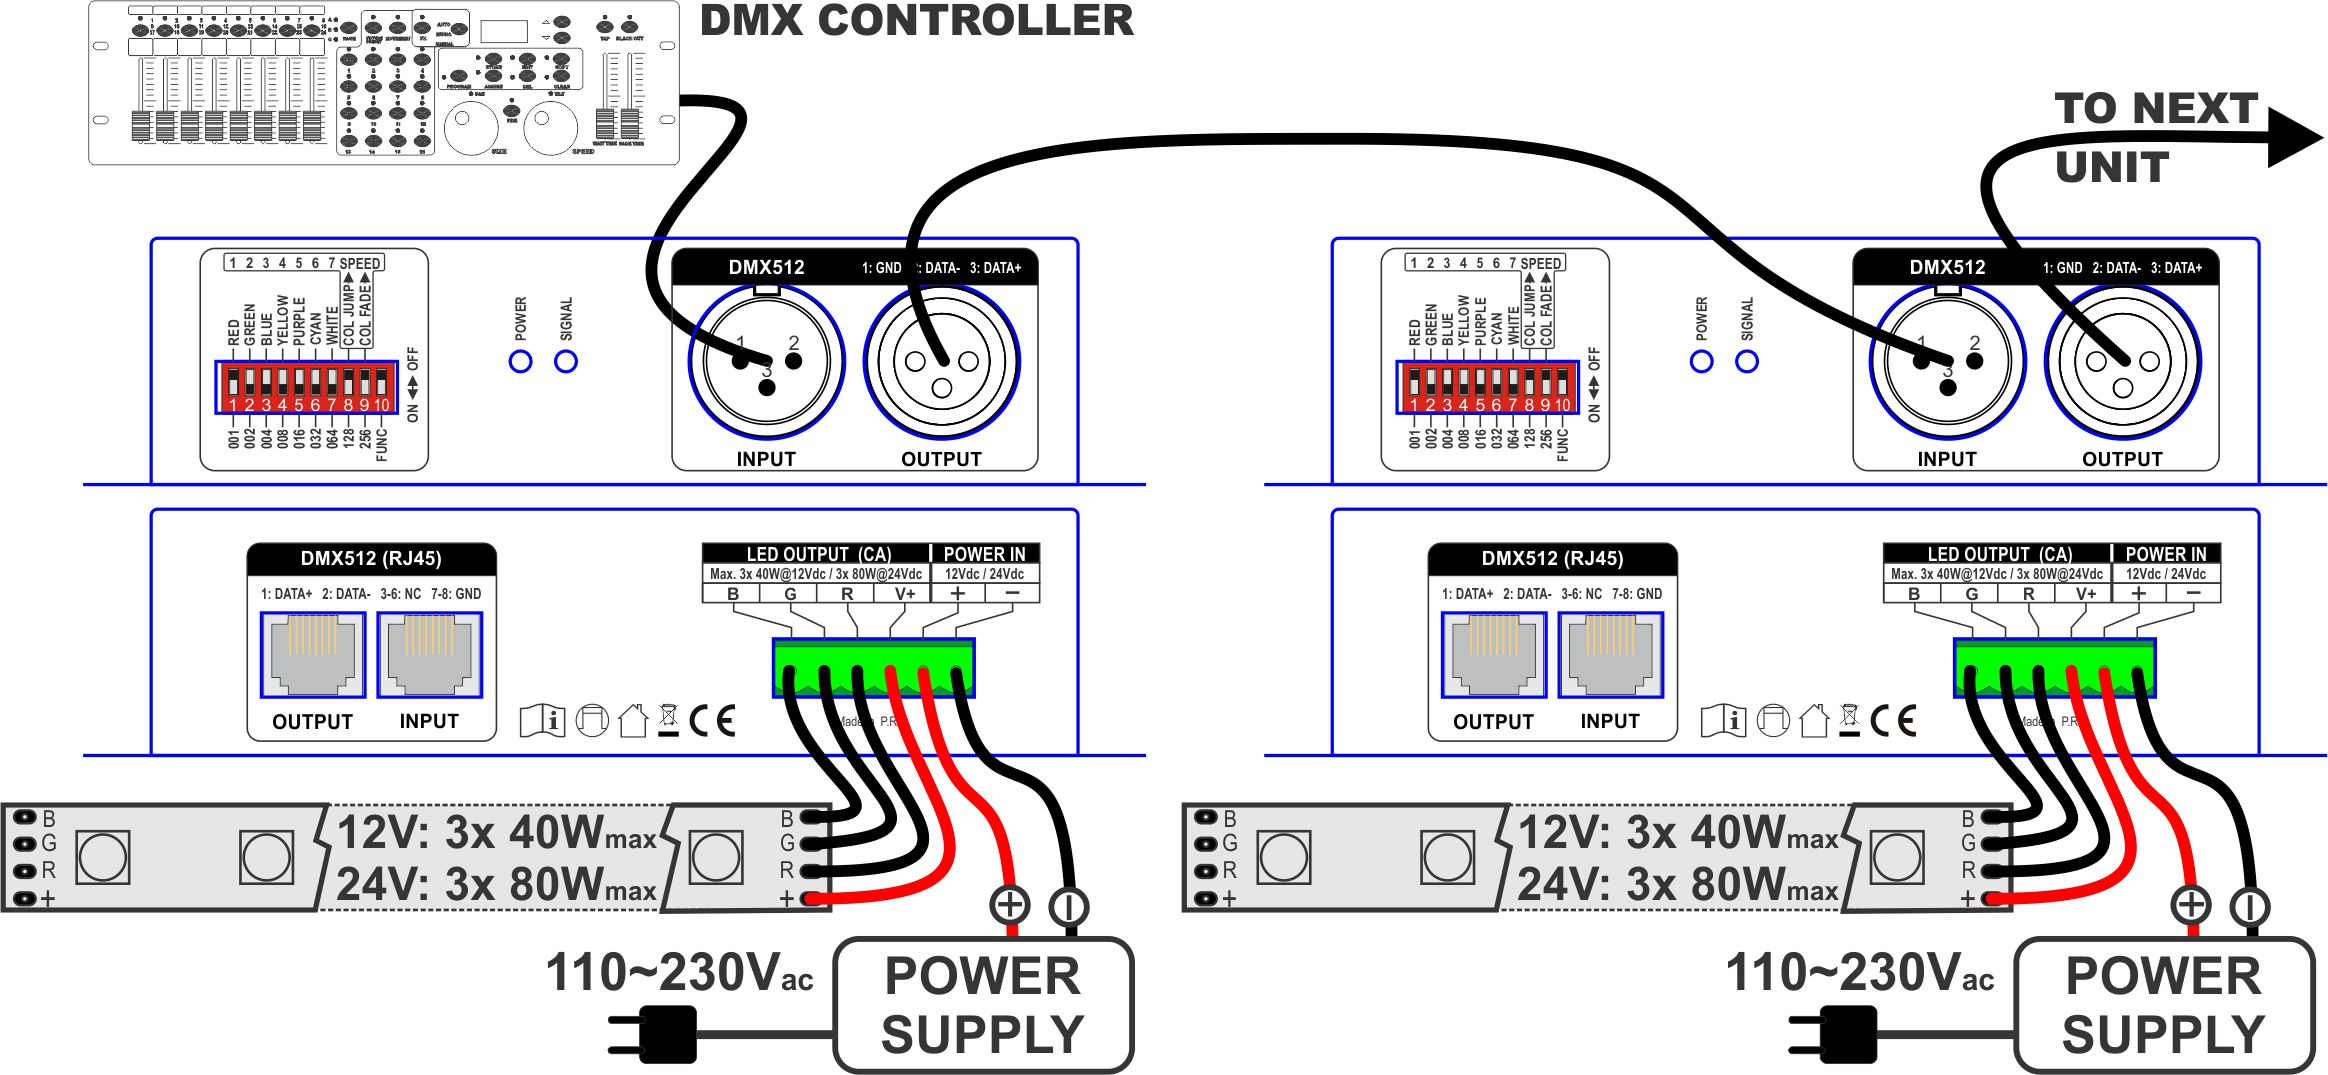 Jb Systems Led Dmx Control Xlr To Rj45 Wiring Diagram